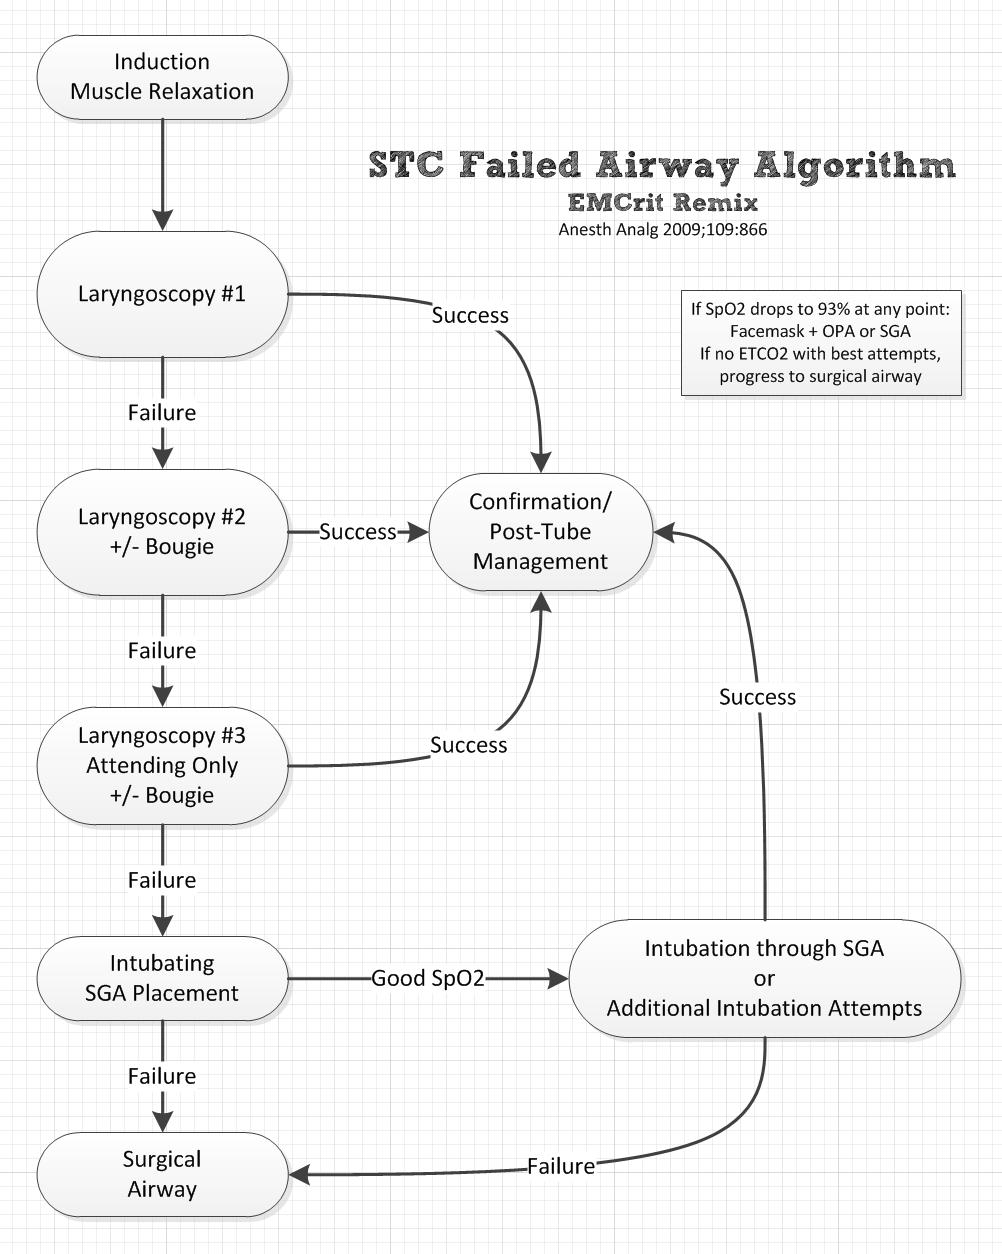 Shock Trauma Failed Airway Algorithm by EMCrit